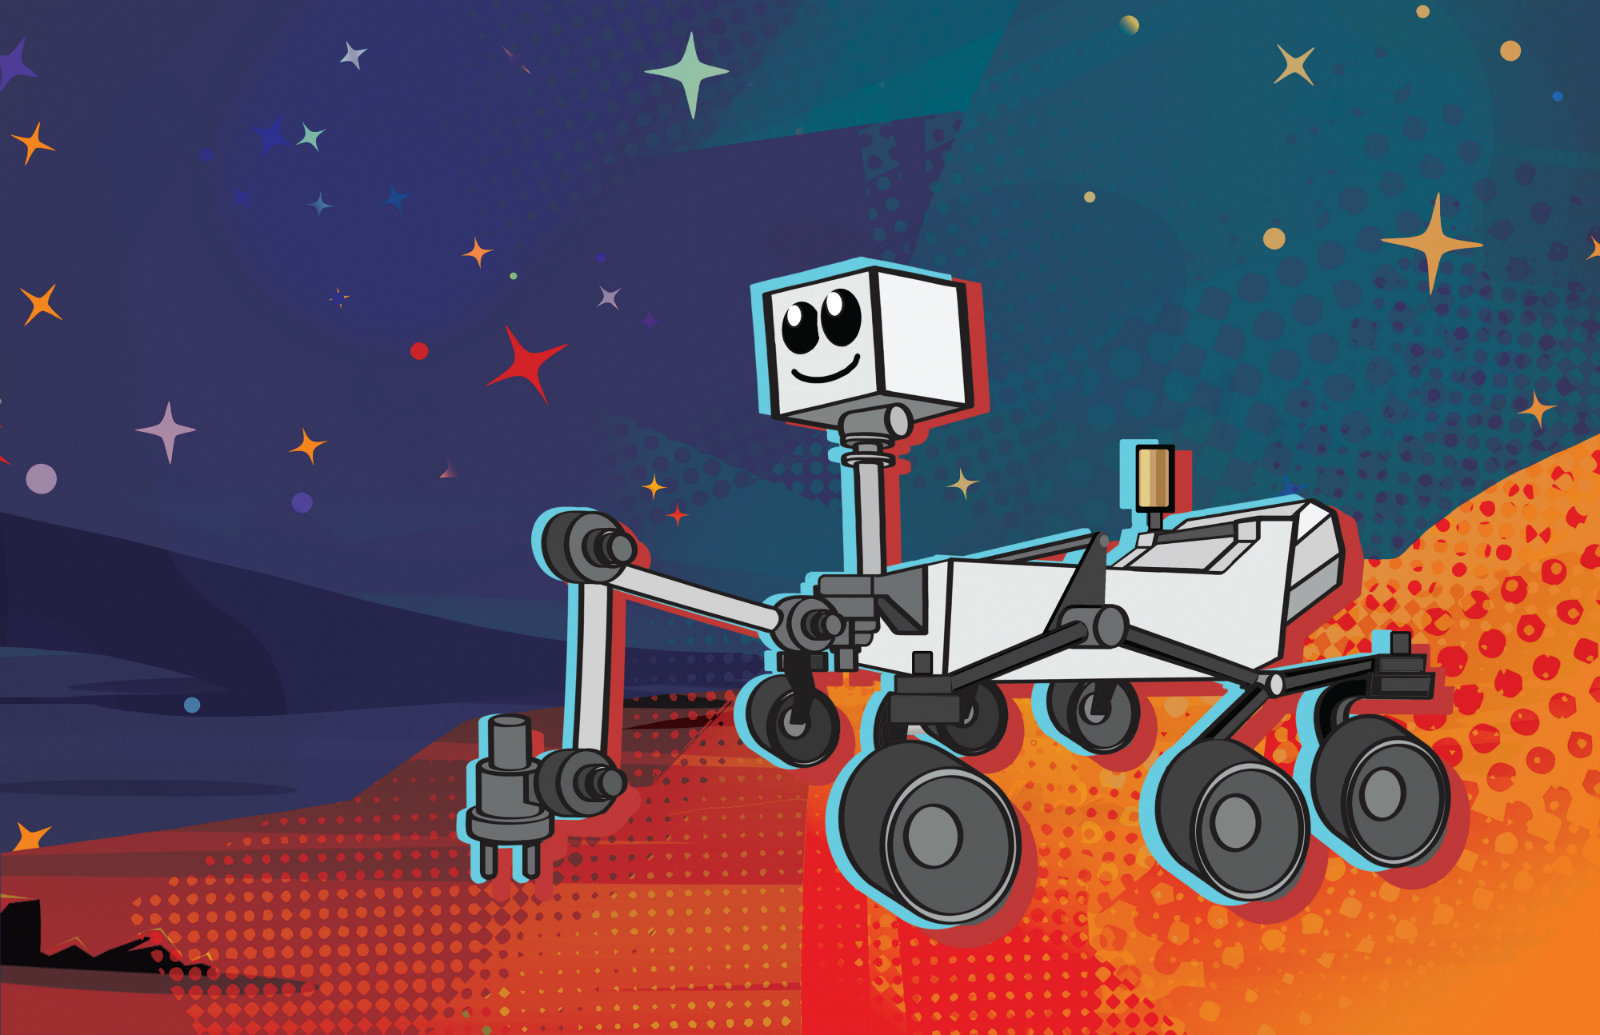 Школьники дадут имя новому марсоходу NASA